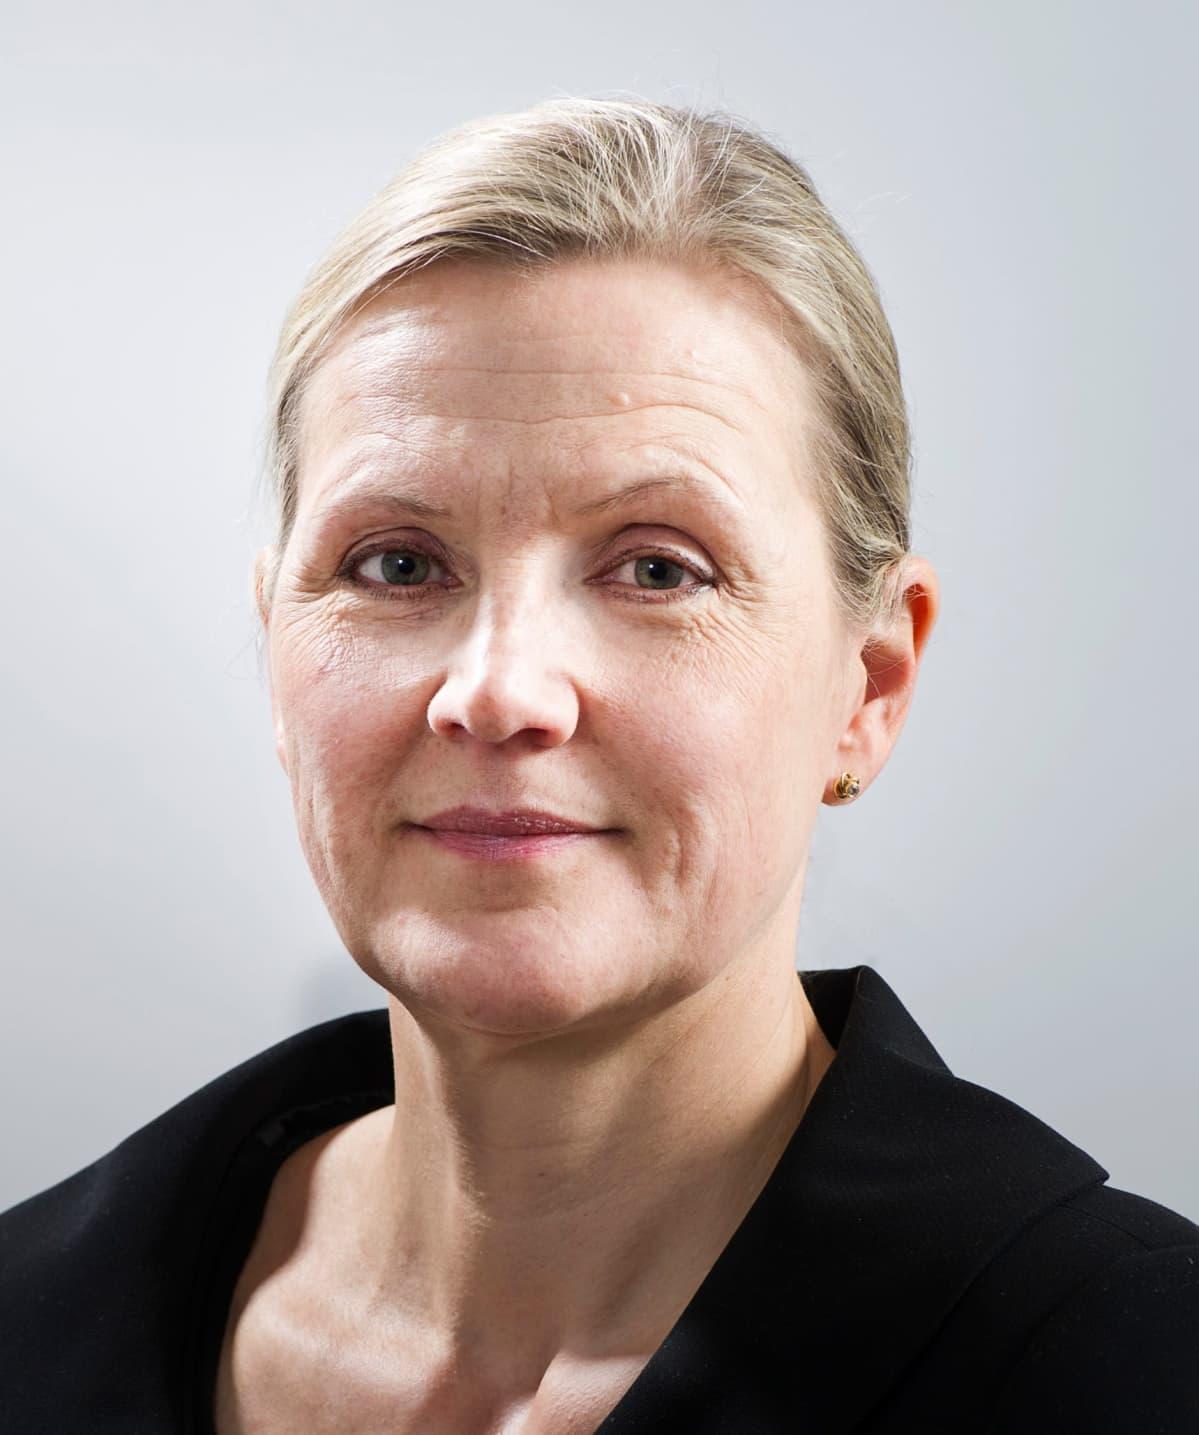 Ravitsemusterapian professori Ursula Schwab